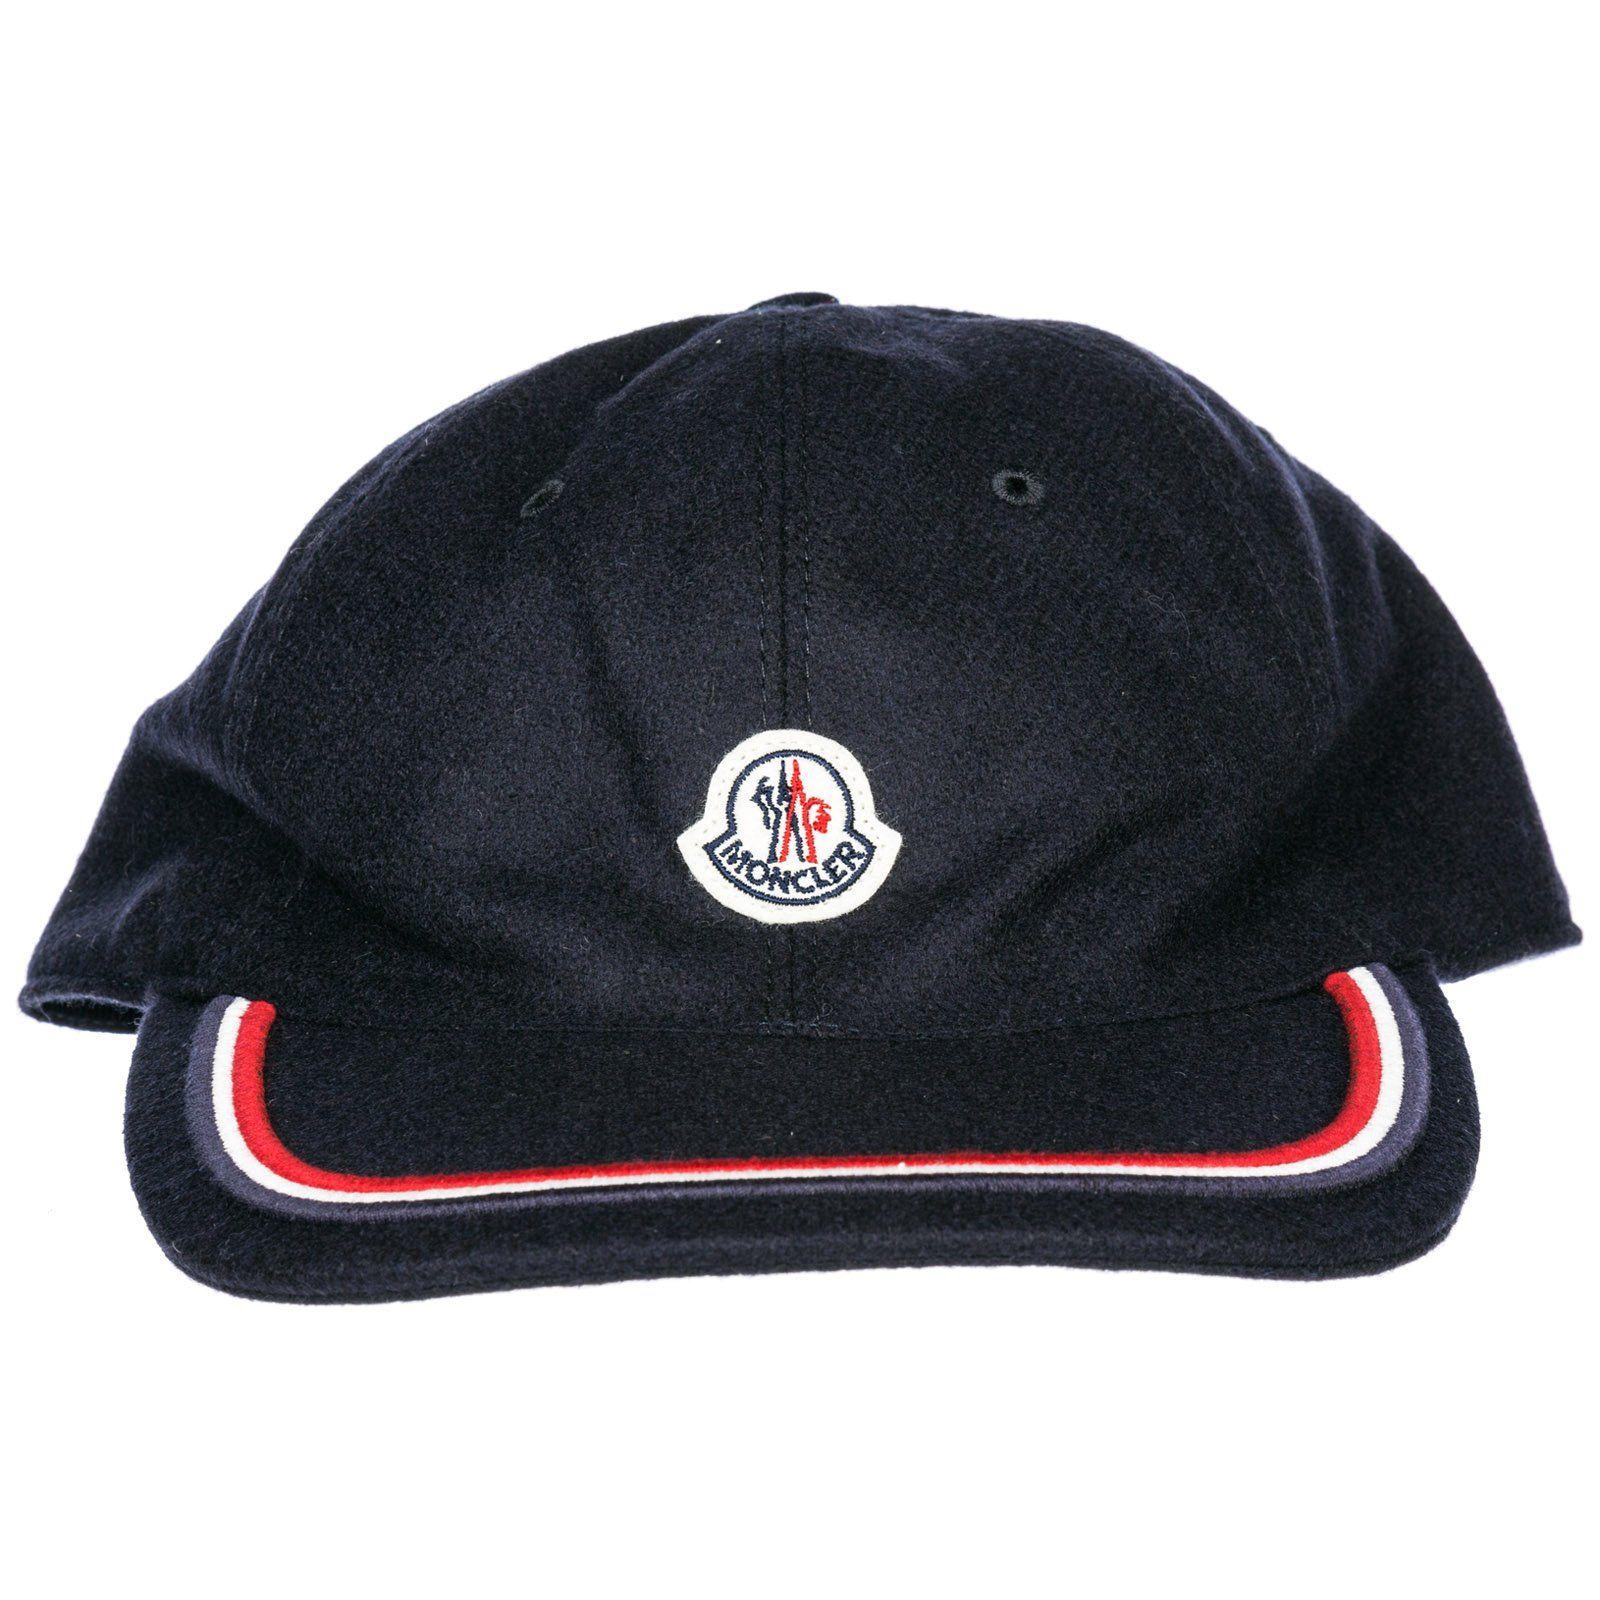 MONCLER MONCLER PATCH BASEBALL CAP.  moncler  9a41de95b334